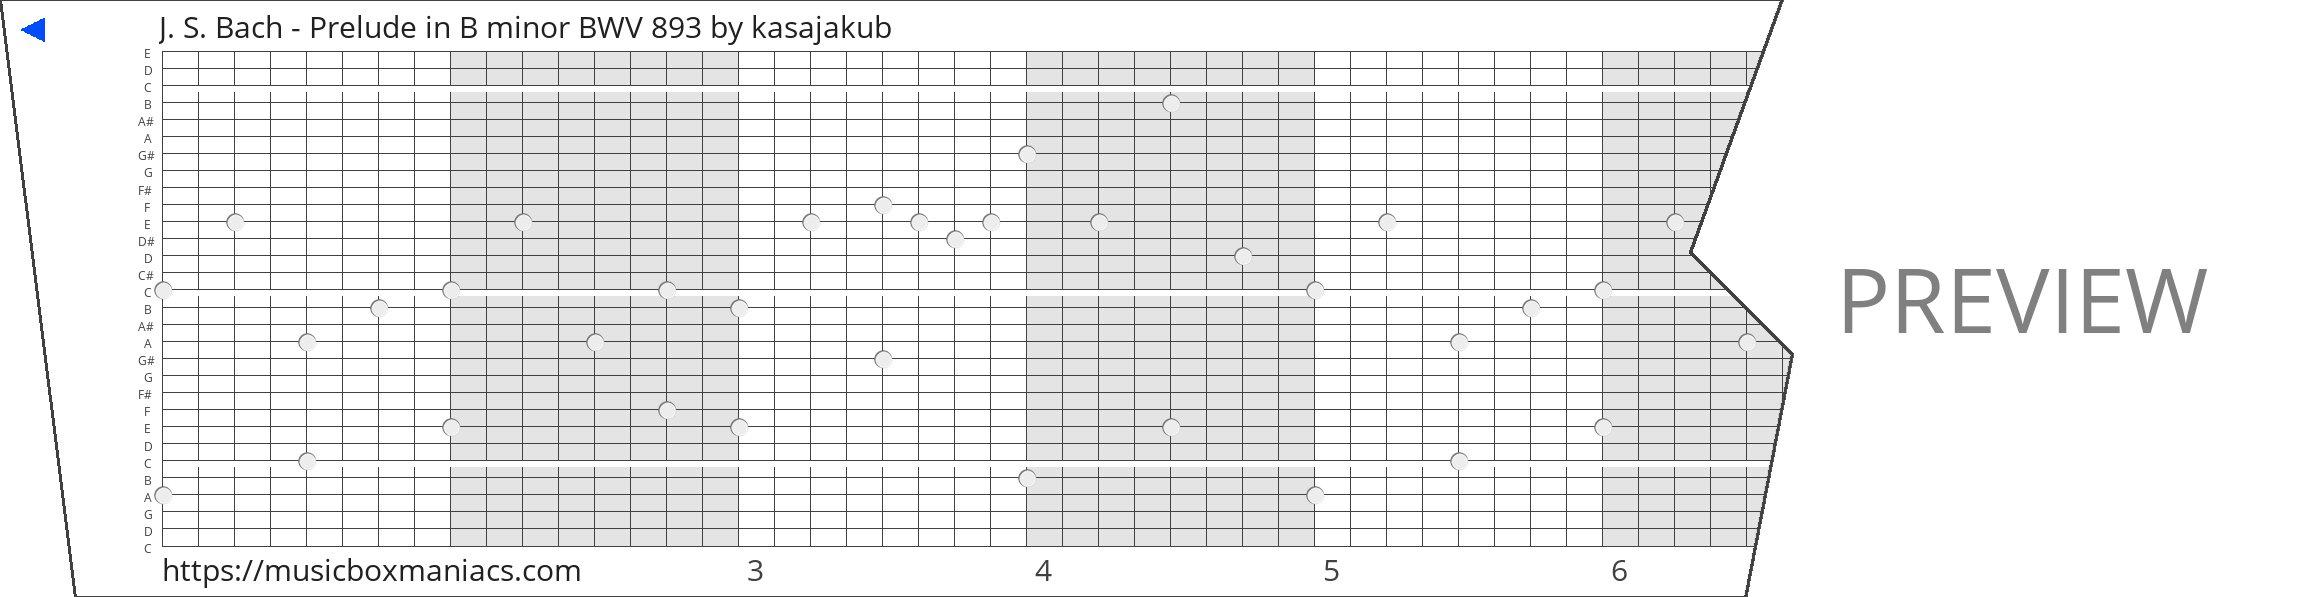 J. S. Bach - Prelude in B minor BWV 893 30 note music box paper strip